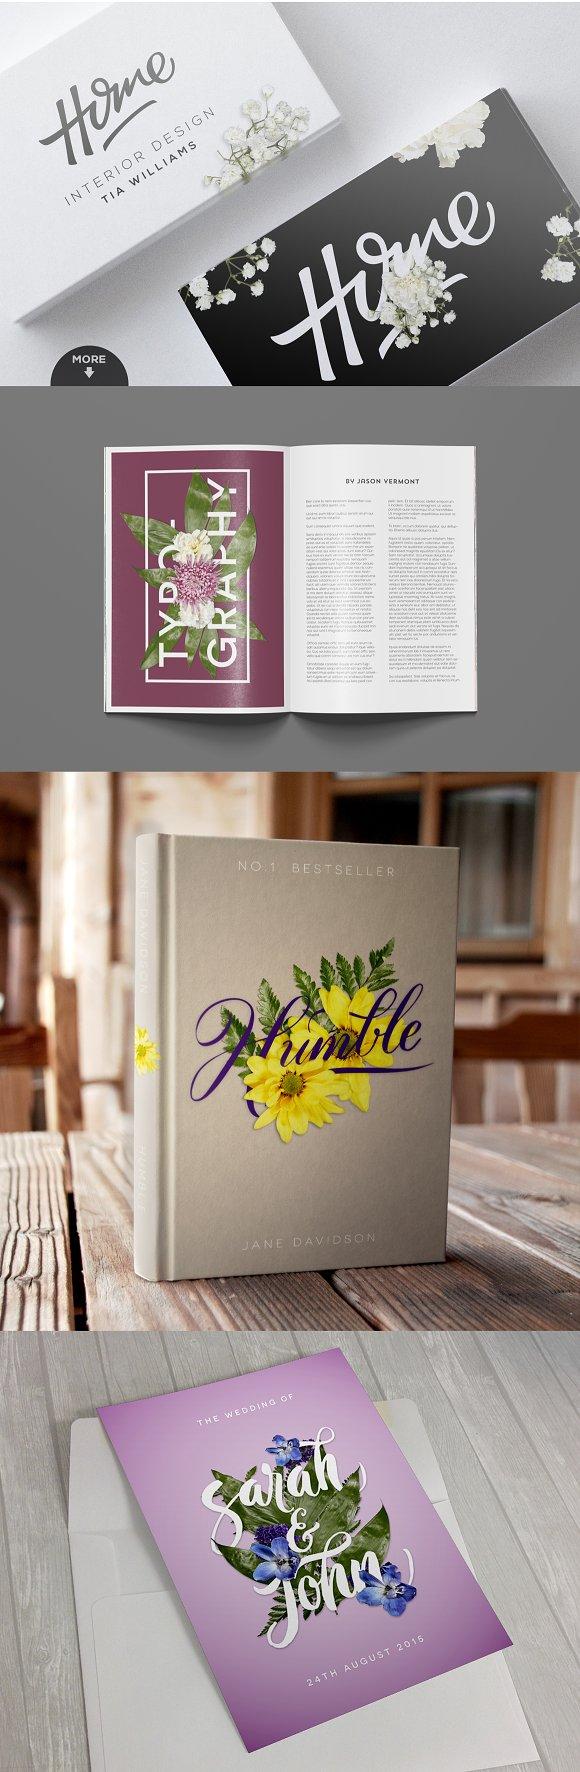 Flowertype For Photoshop Layer Styles Creative Market Mystore365com Meter6013capacitancecapacitortesterincircuithtml